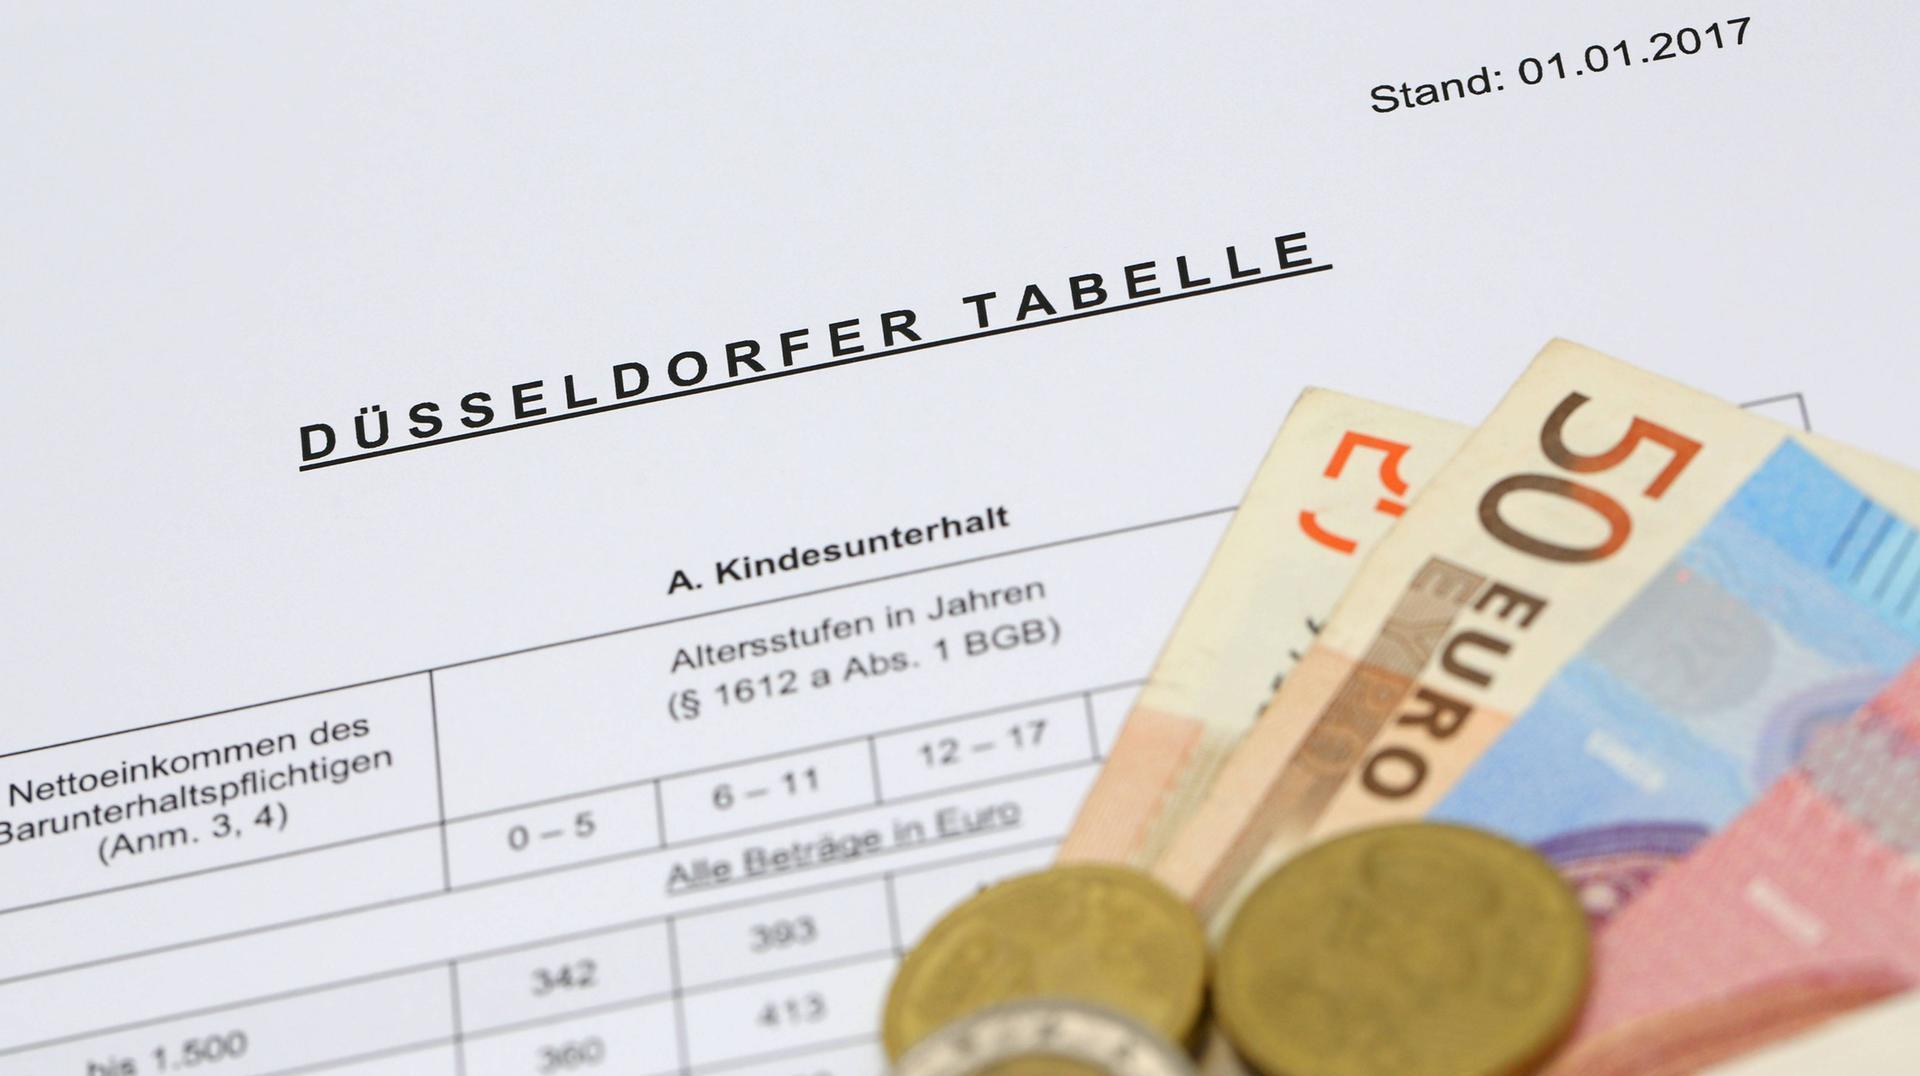 Düsseldorfer Tabelle 2018  Kindesunterhalt Düsseldorfer Tabelle 2018 – So viel ist